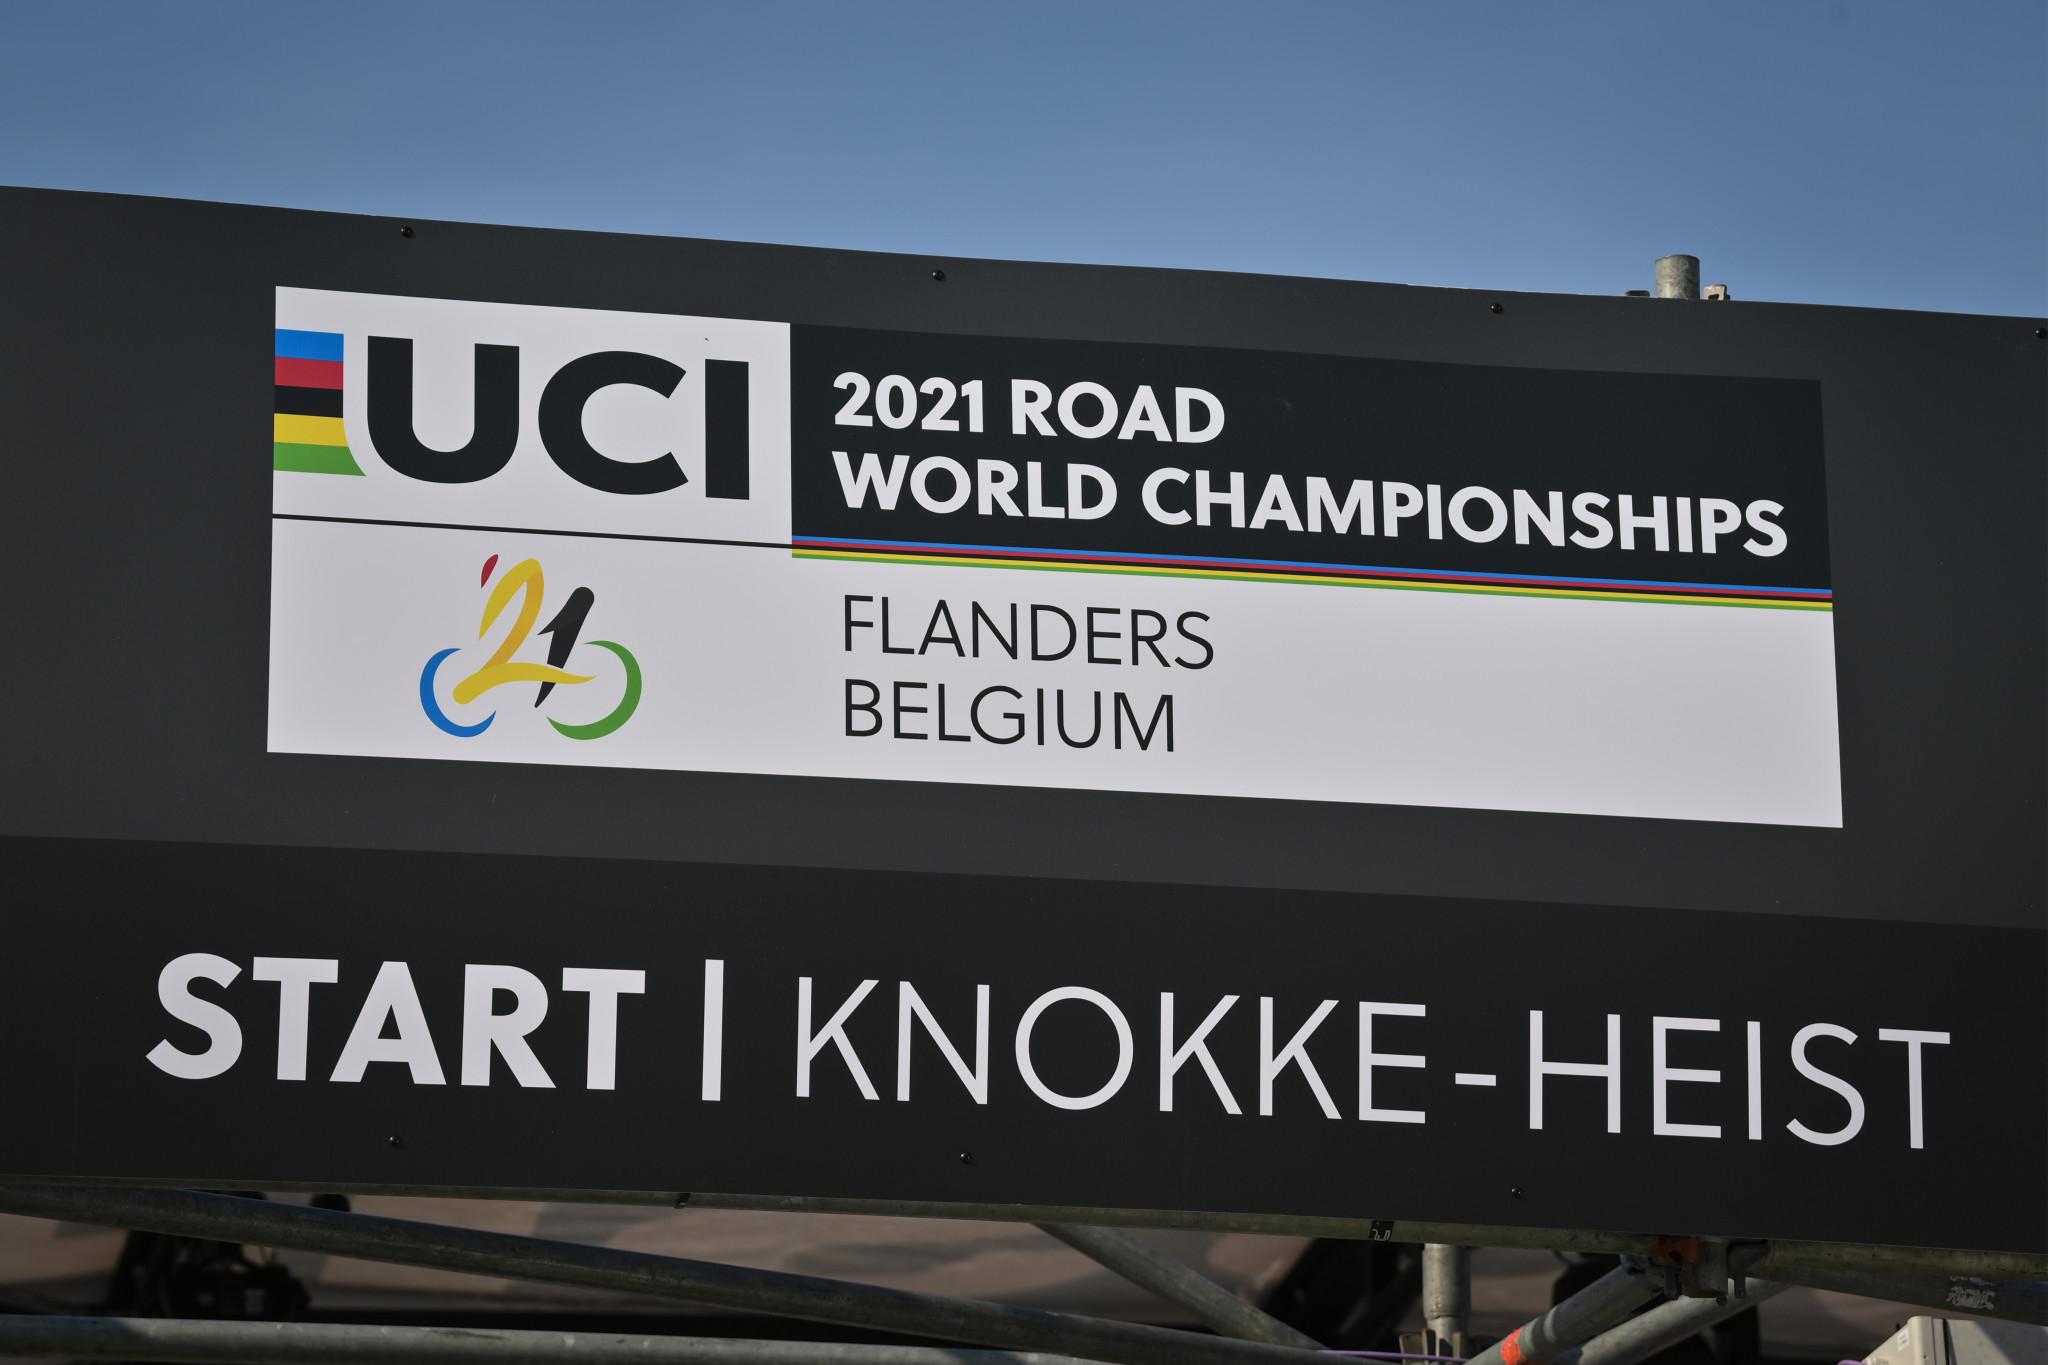 Van Aert and Evenepoel eye success at UCI Road World Championships in Flanders